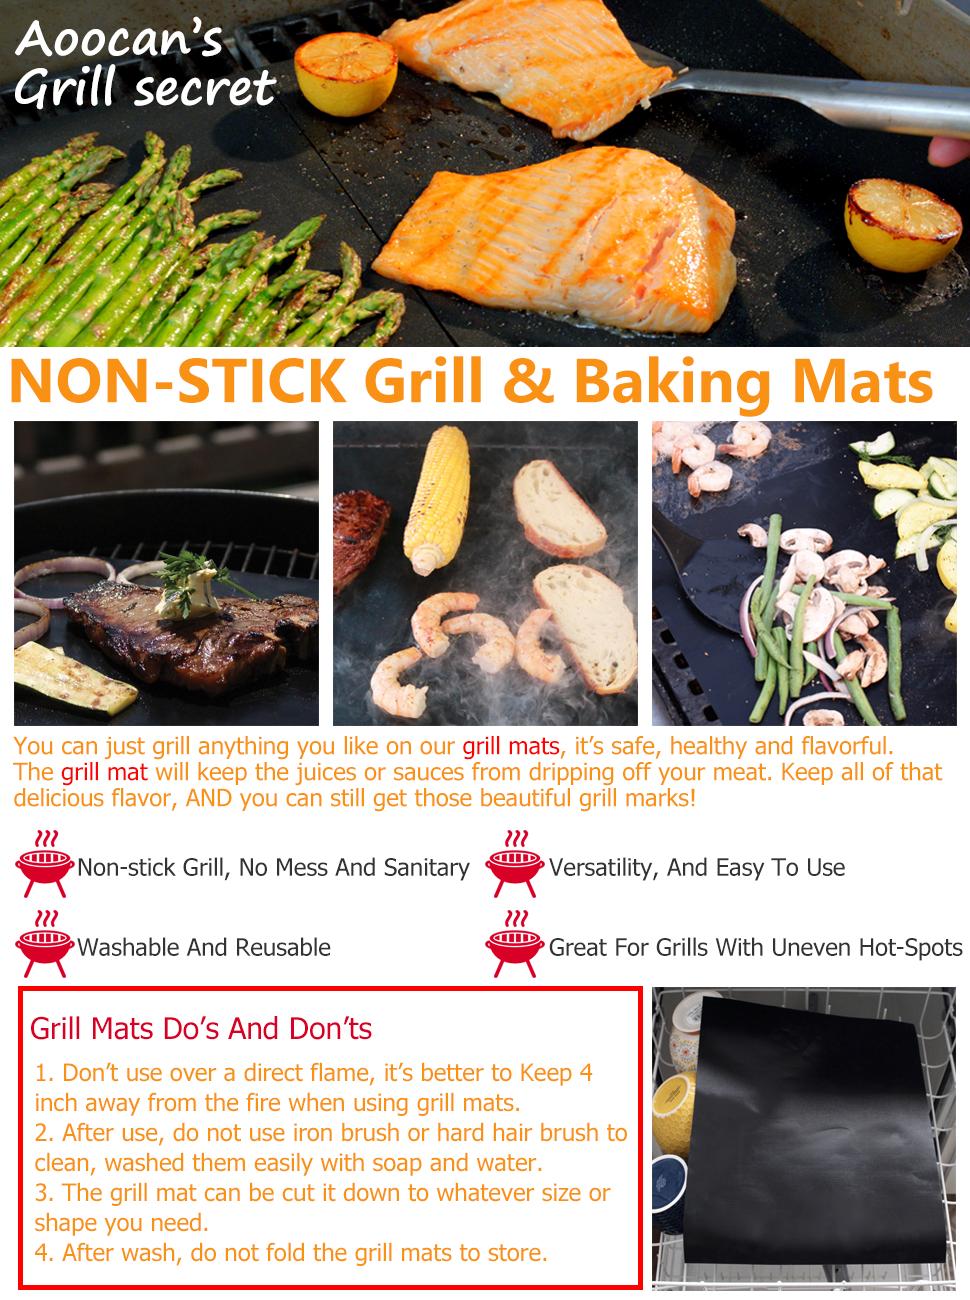 Non-stick grill mats - Aoocan